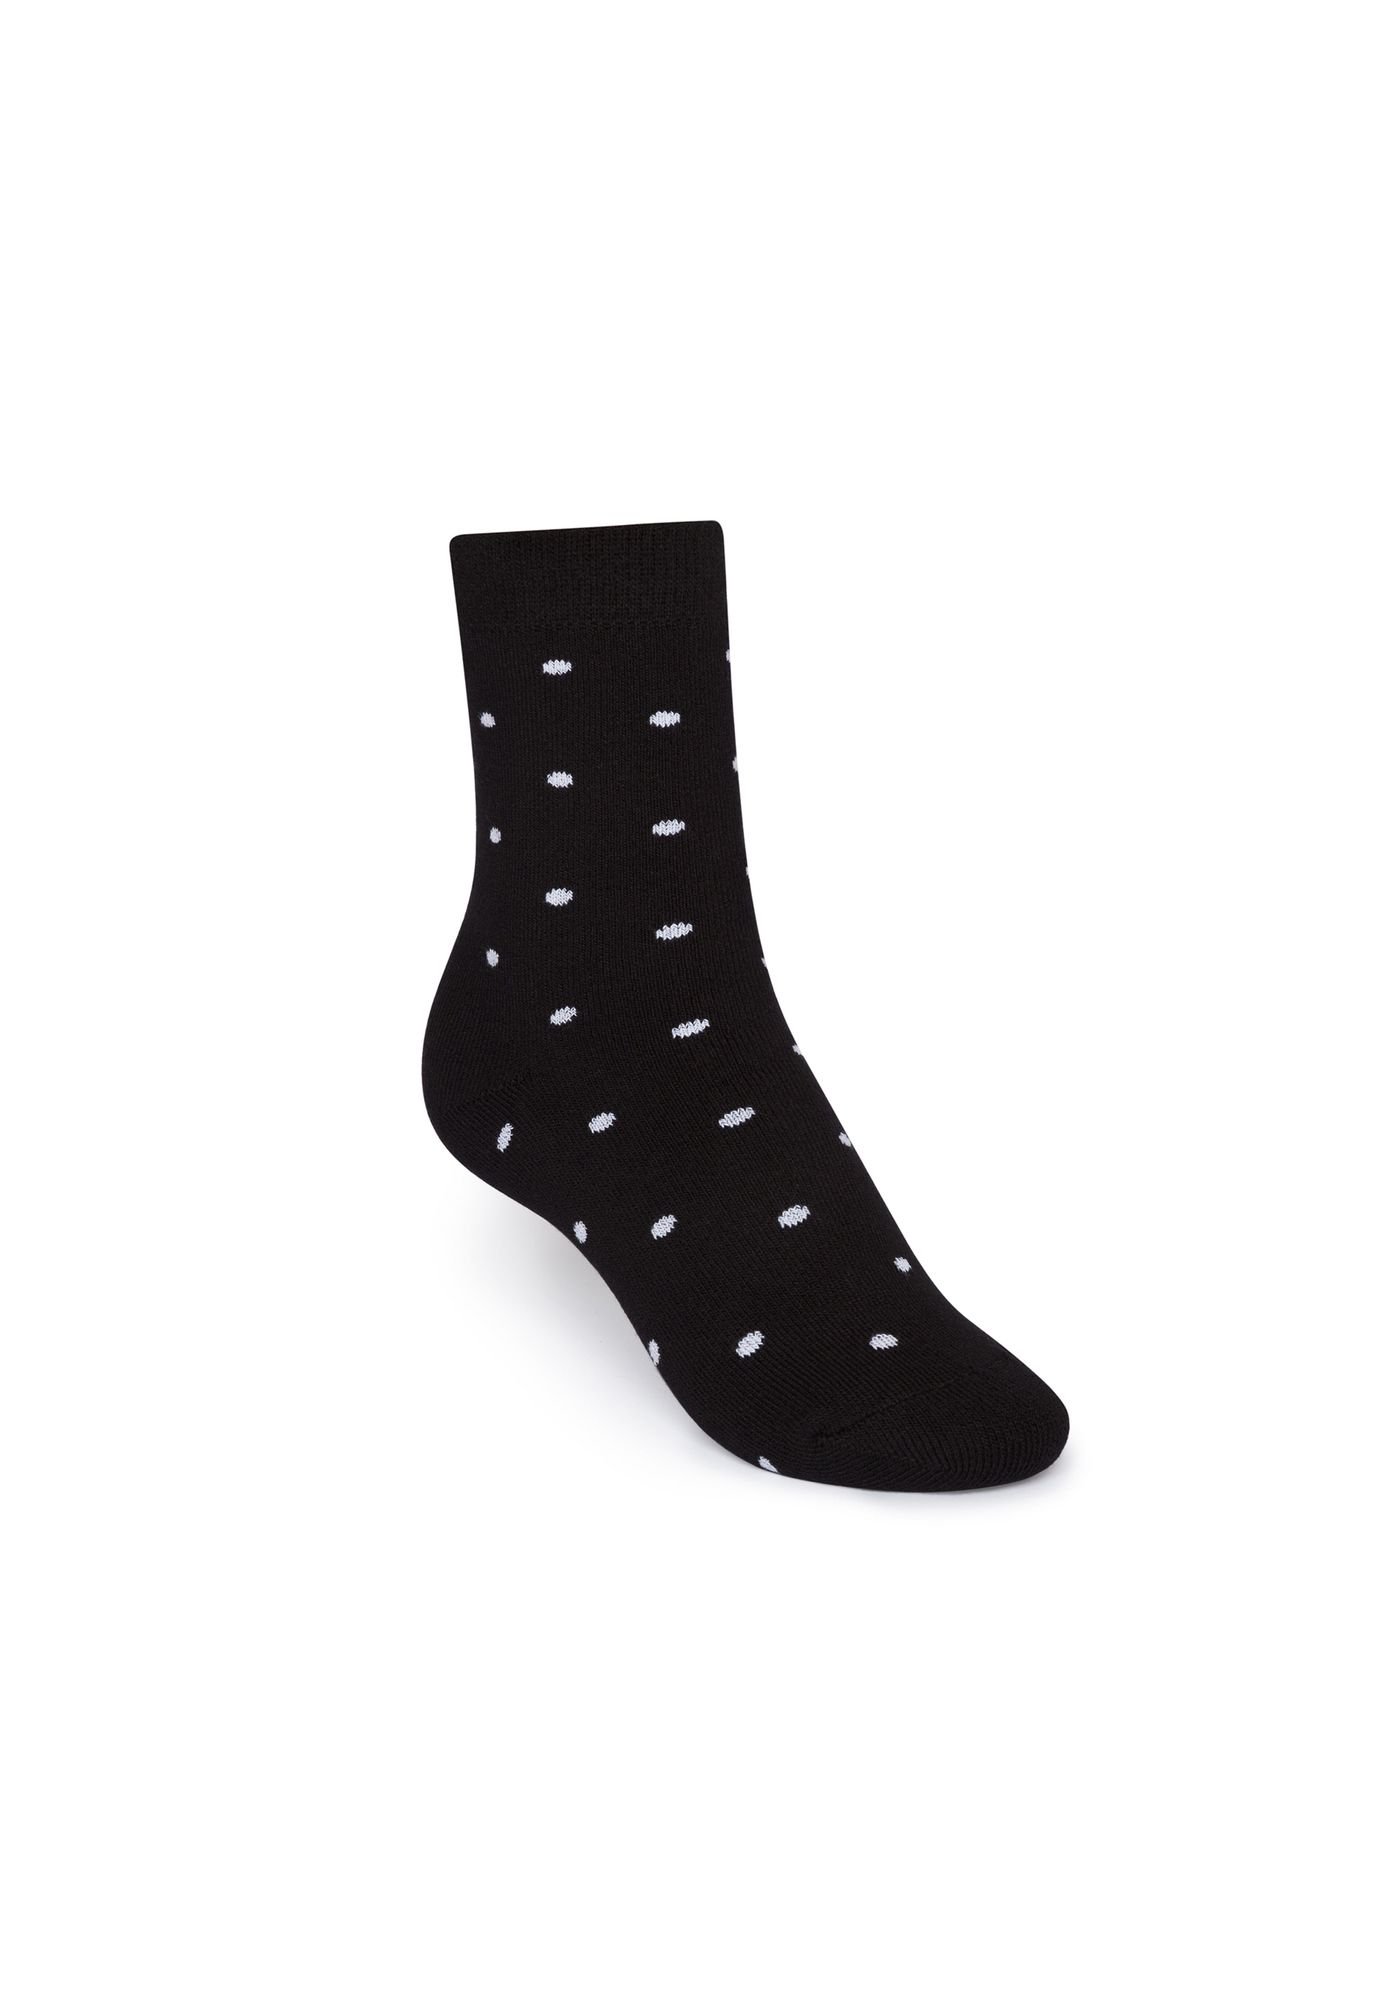 Terry Mid Socks Dotties Black